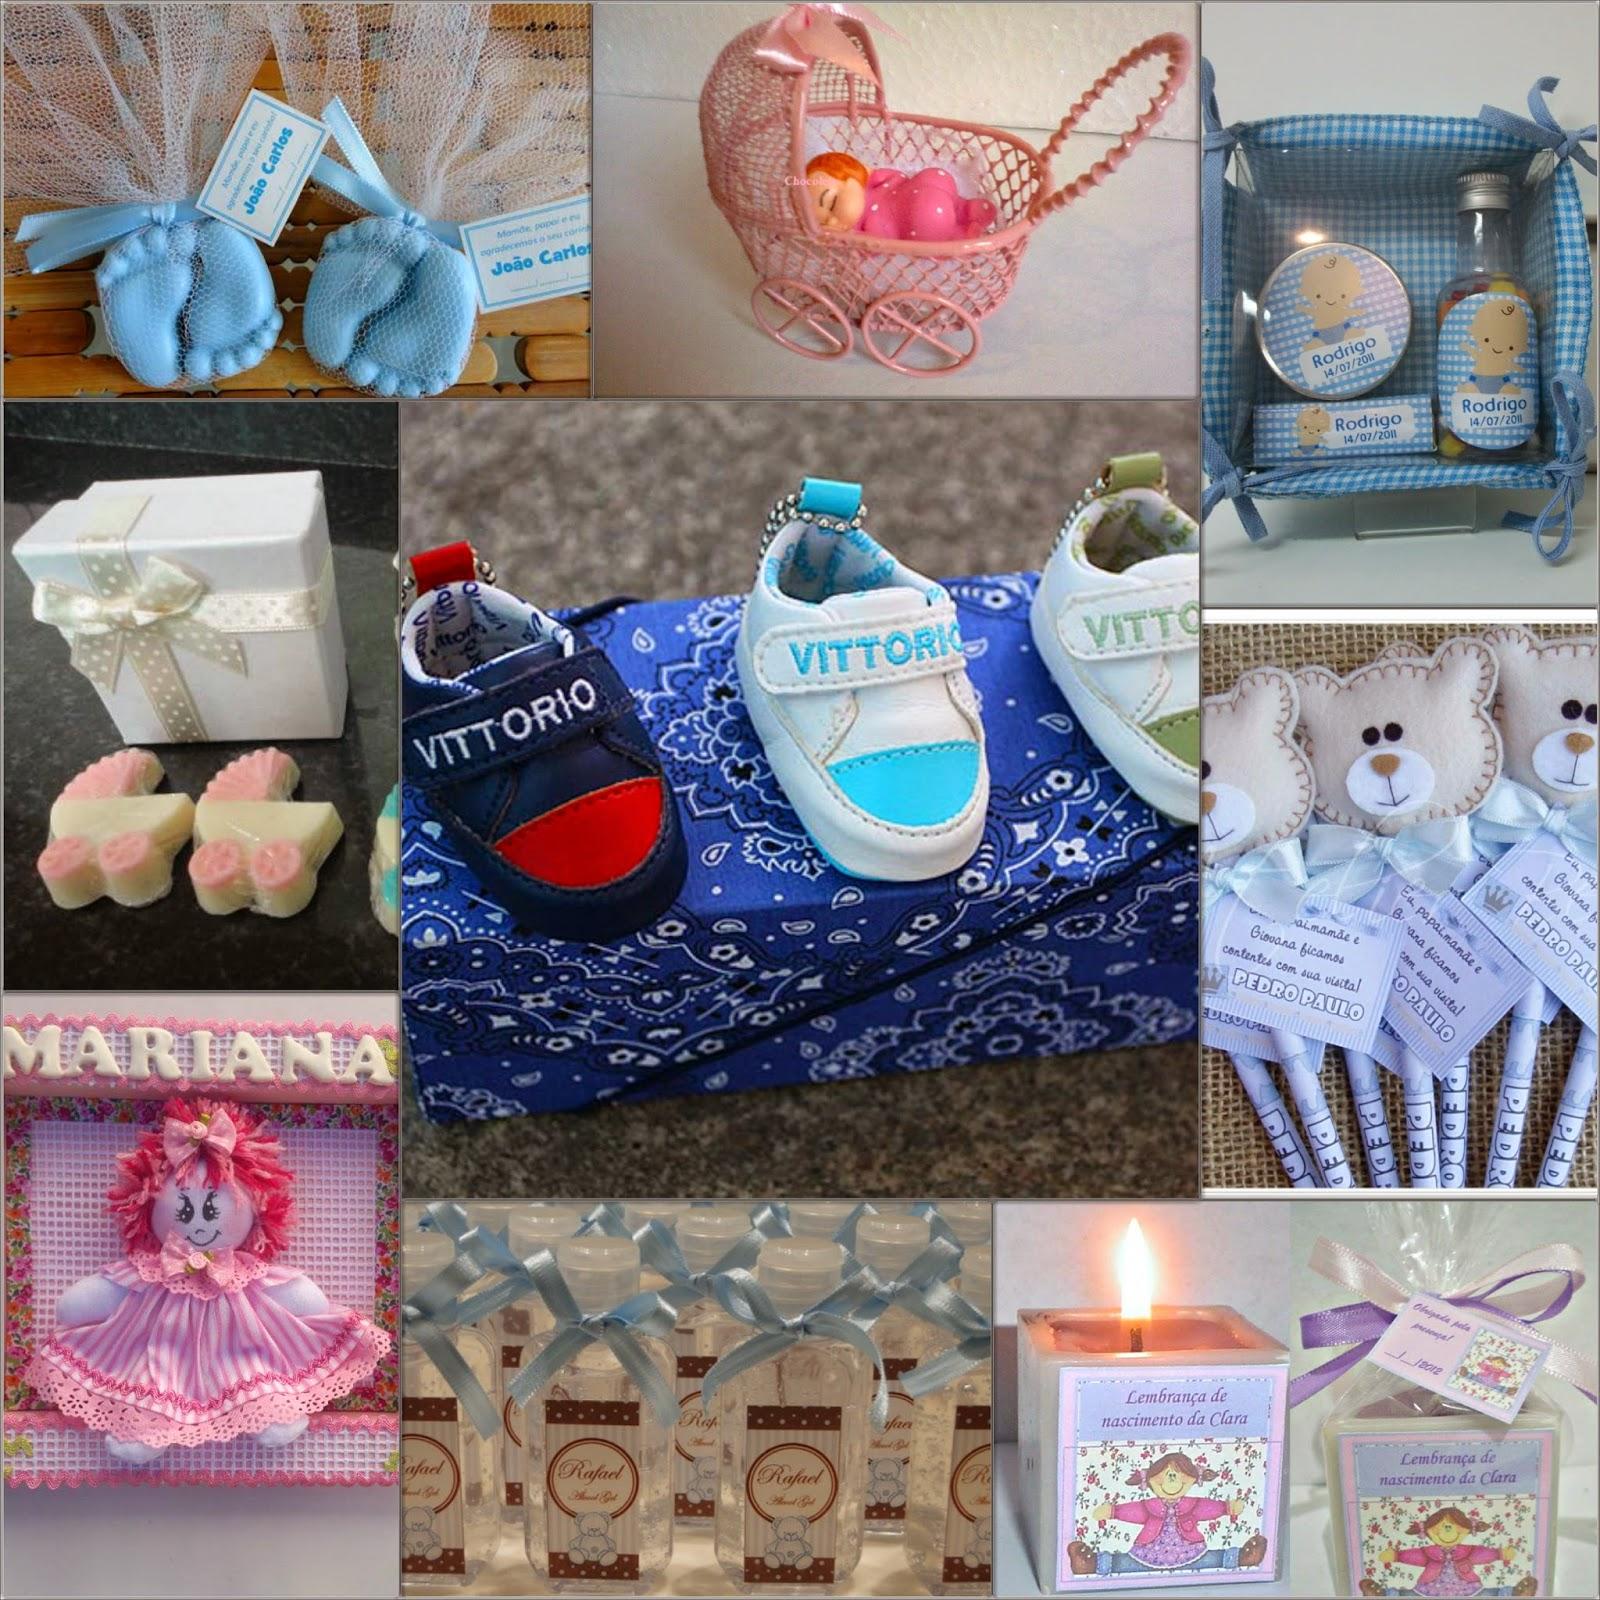 jogos de bebe-bebe store-nomes de bebe-bebe-bebes-carrinho-quadro infantil-lista de enxoval de bebe-lista de enxoval de bebe-jogos de nenem-nenem-blog infantil-bb-bh-Souvenir-Baby-Mutterschafts-Schwangerschaft-Geburt-recuerdo-baby-maternidad-embarazo-parto-souvenir-baby-maternity-pregnancy-childbirth-bebes